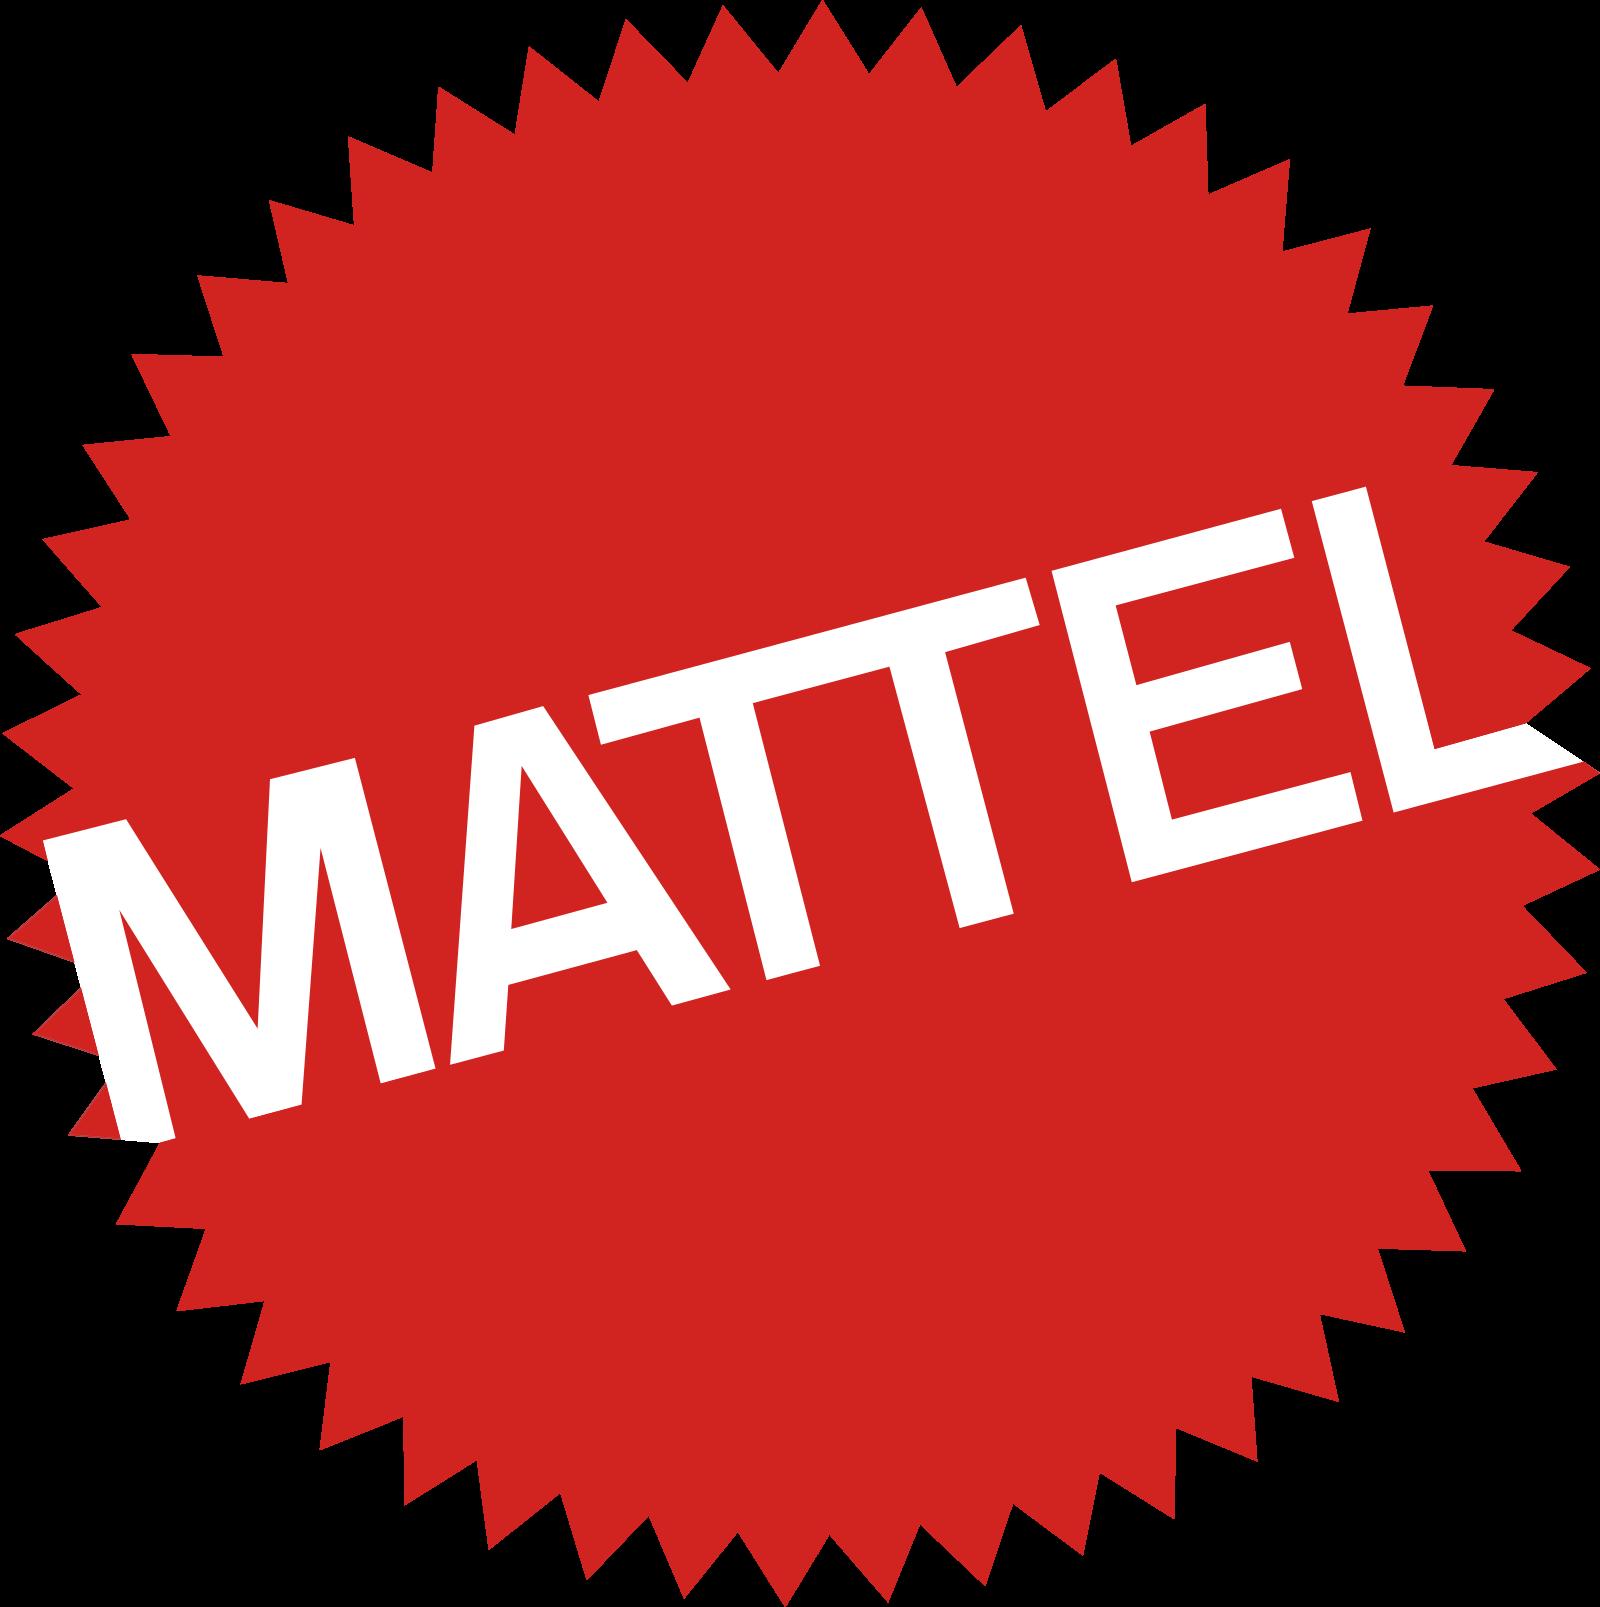 Logo Brettspieleverlag Mattel